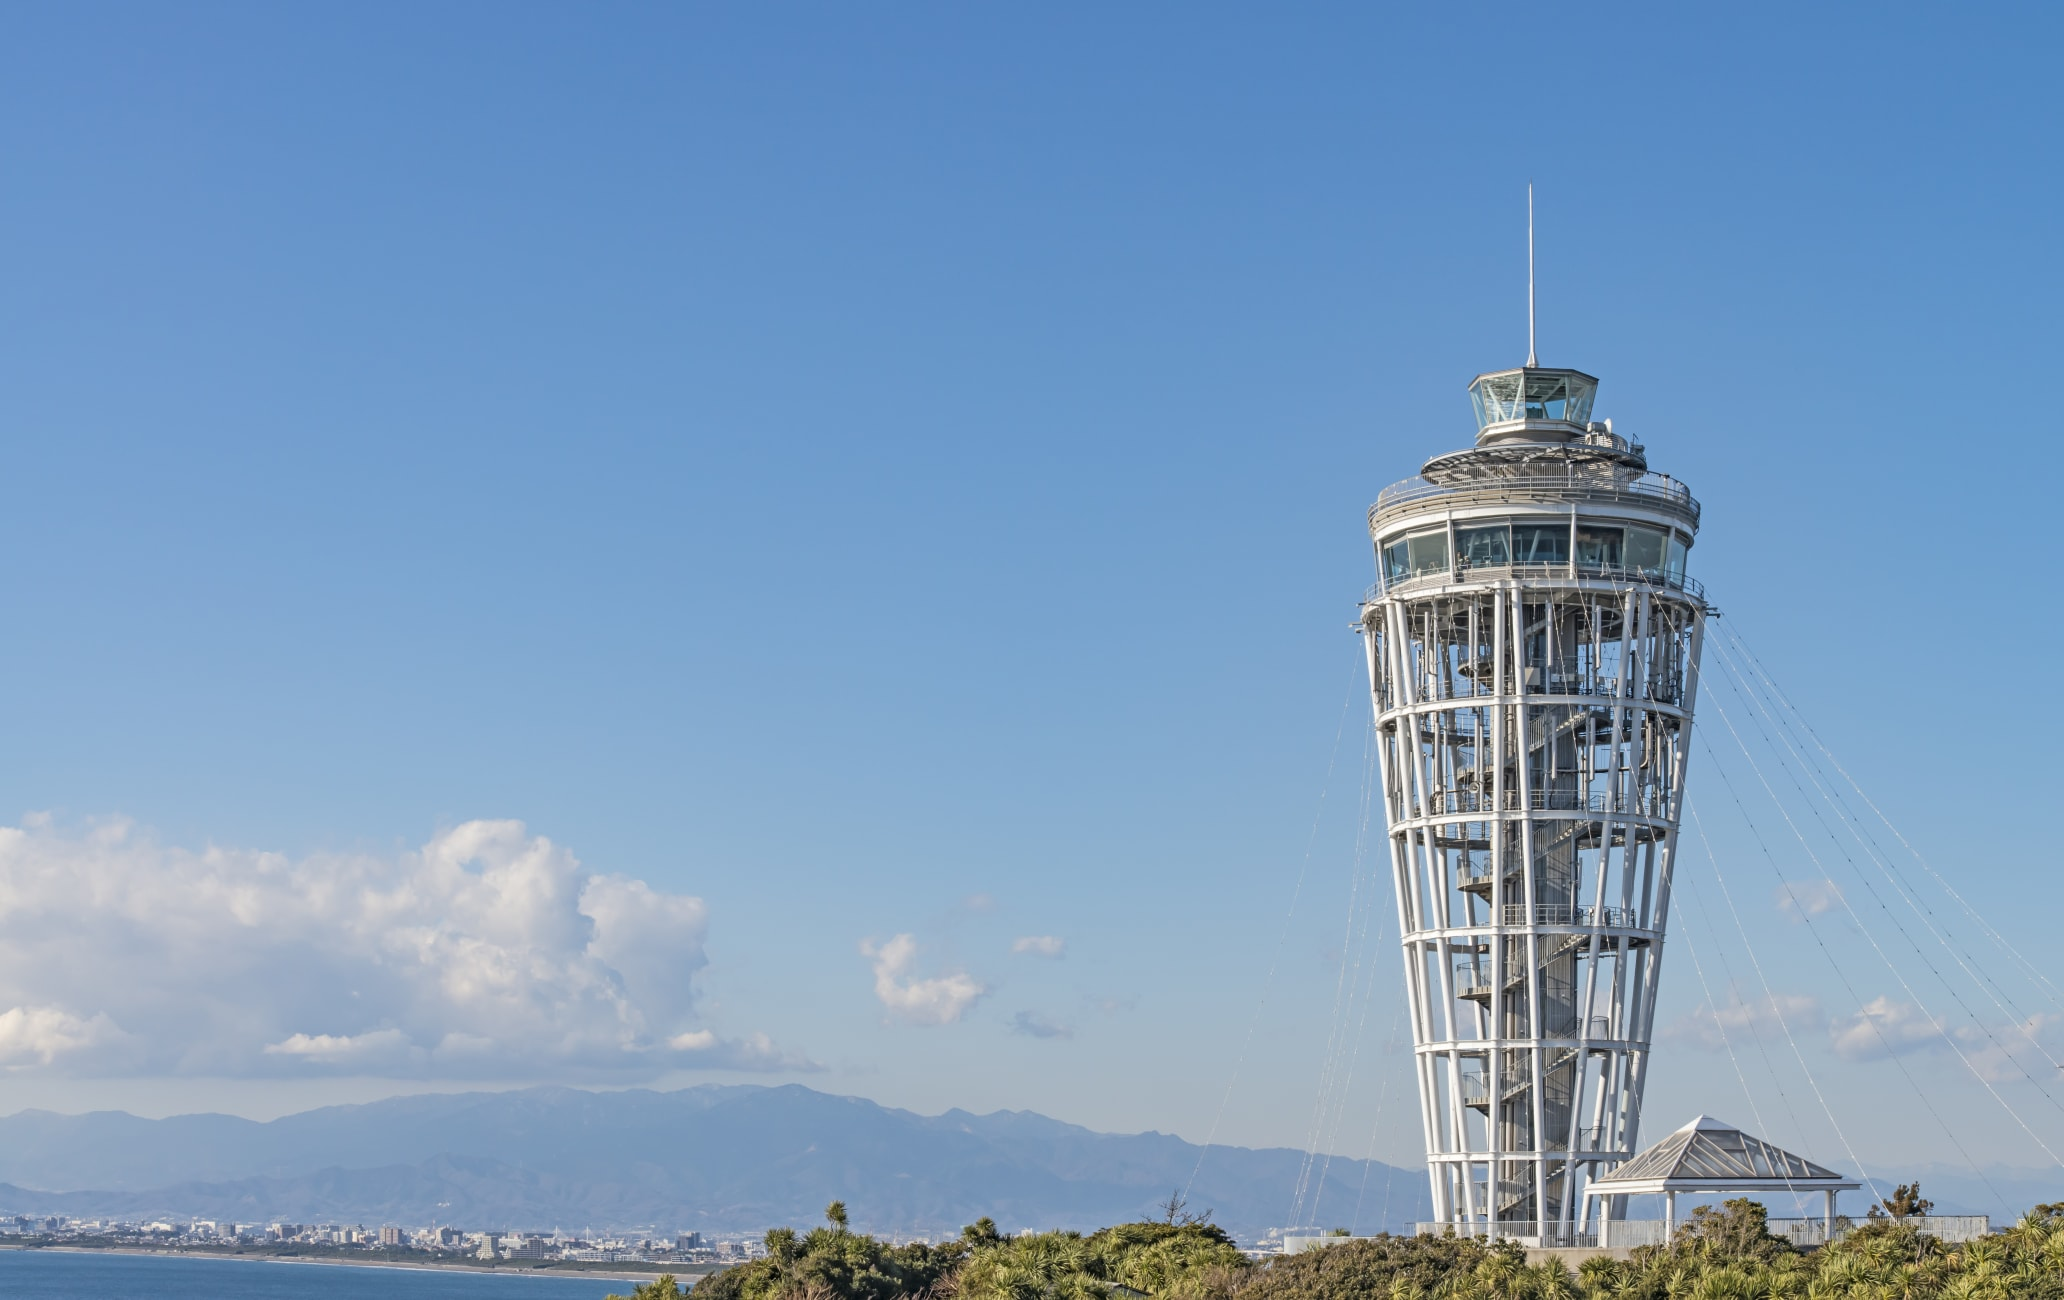 Enoshima Sea Candle